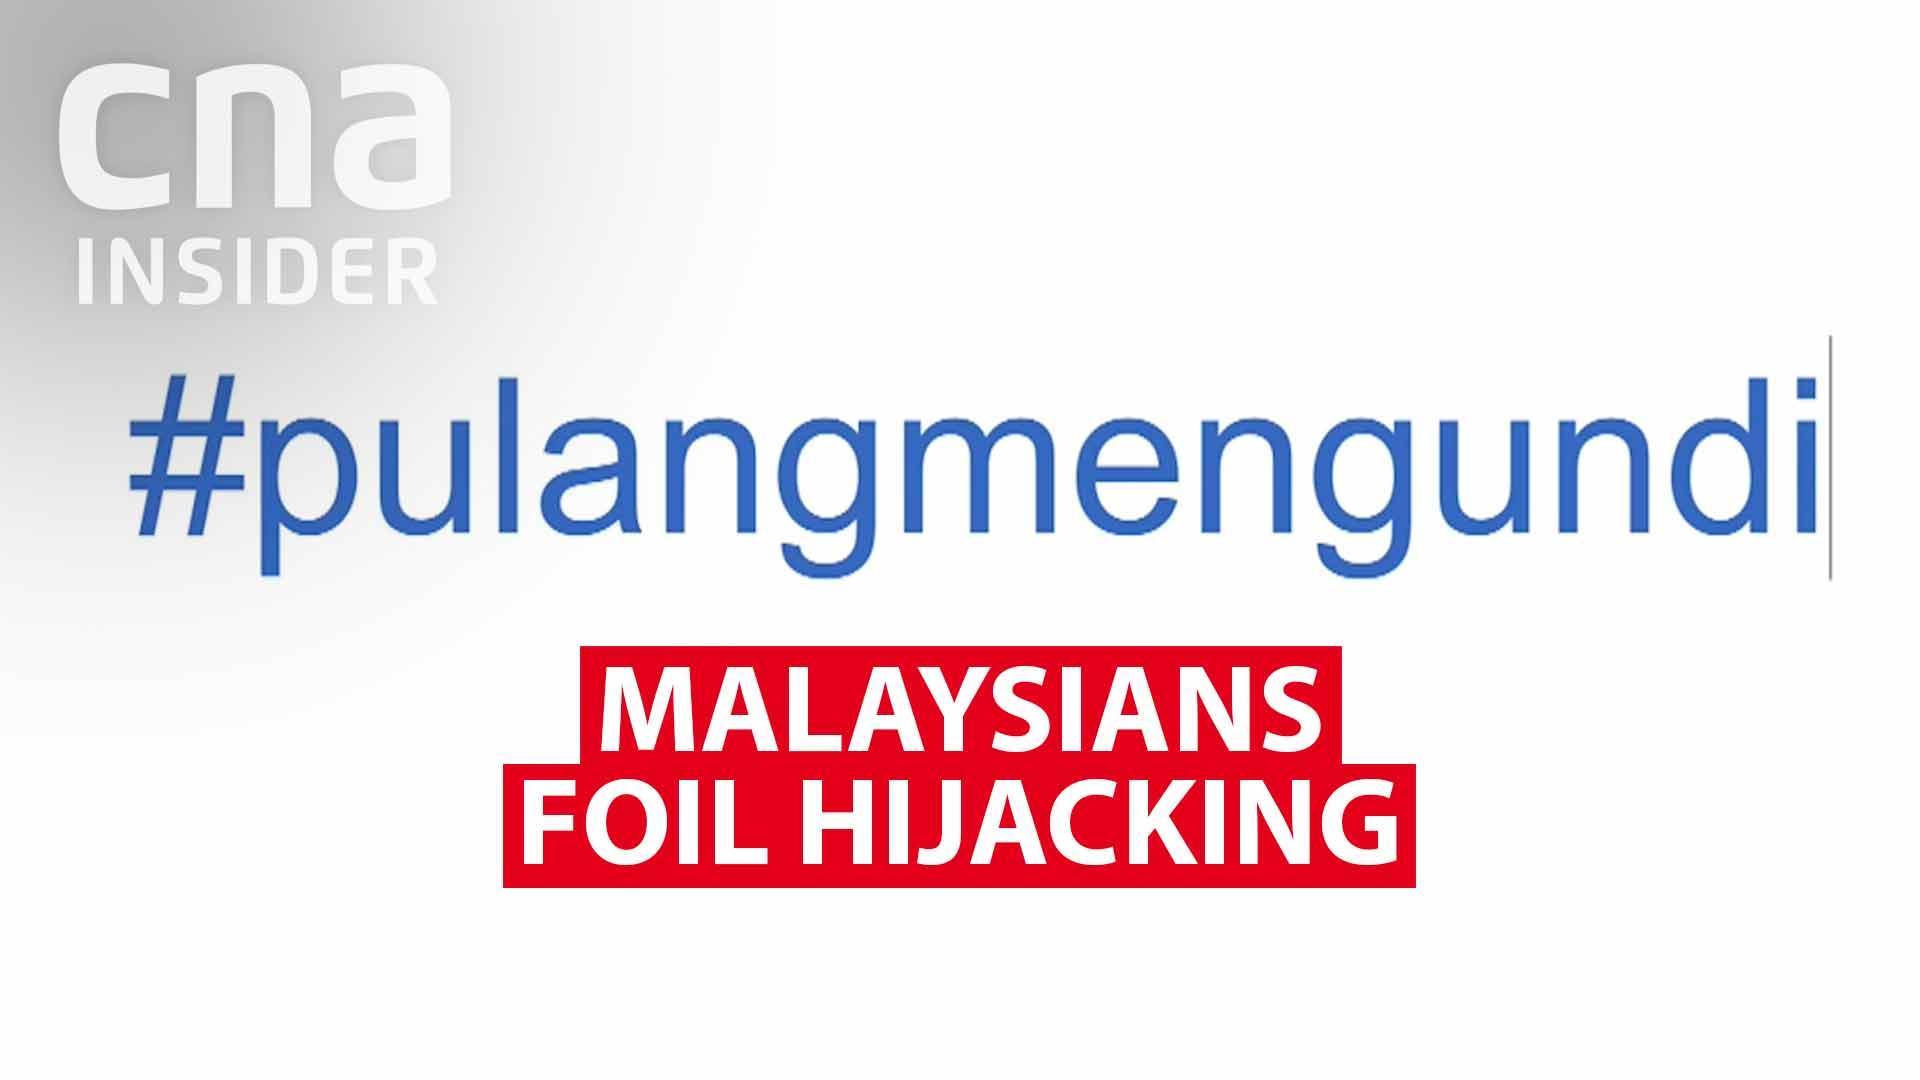 Malaysians foil hijacking